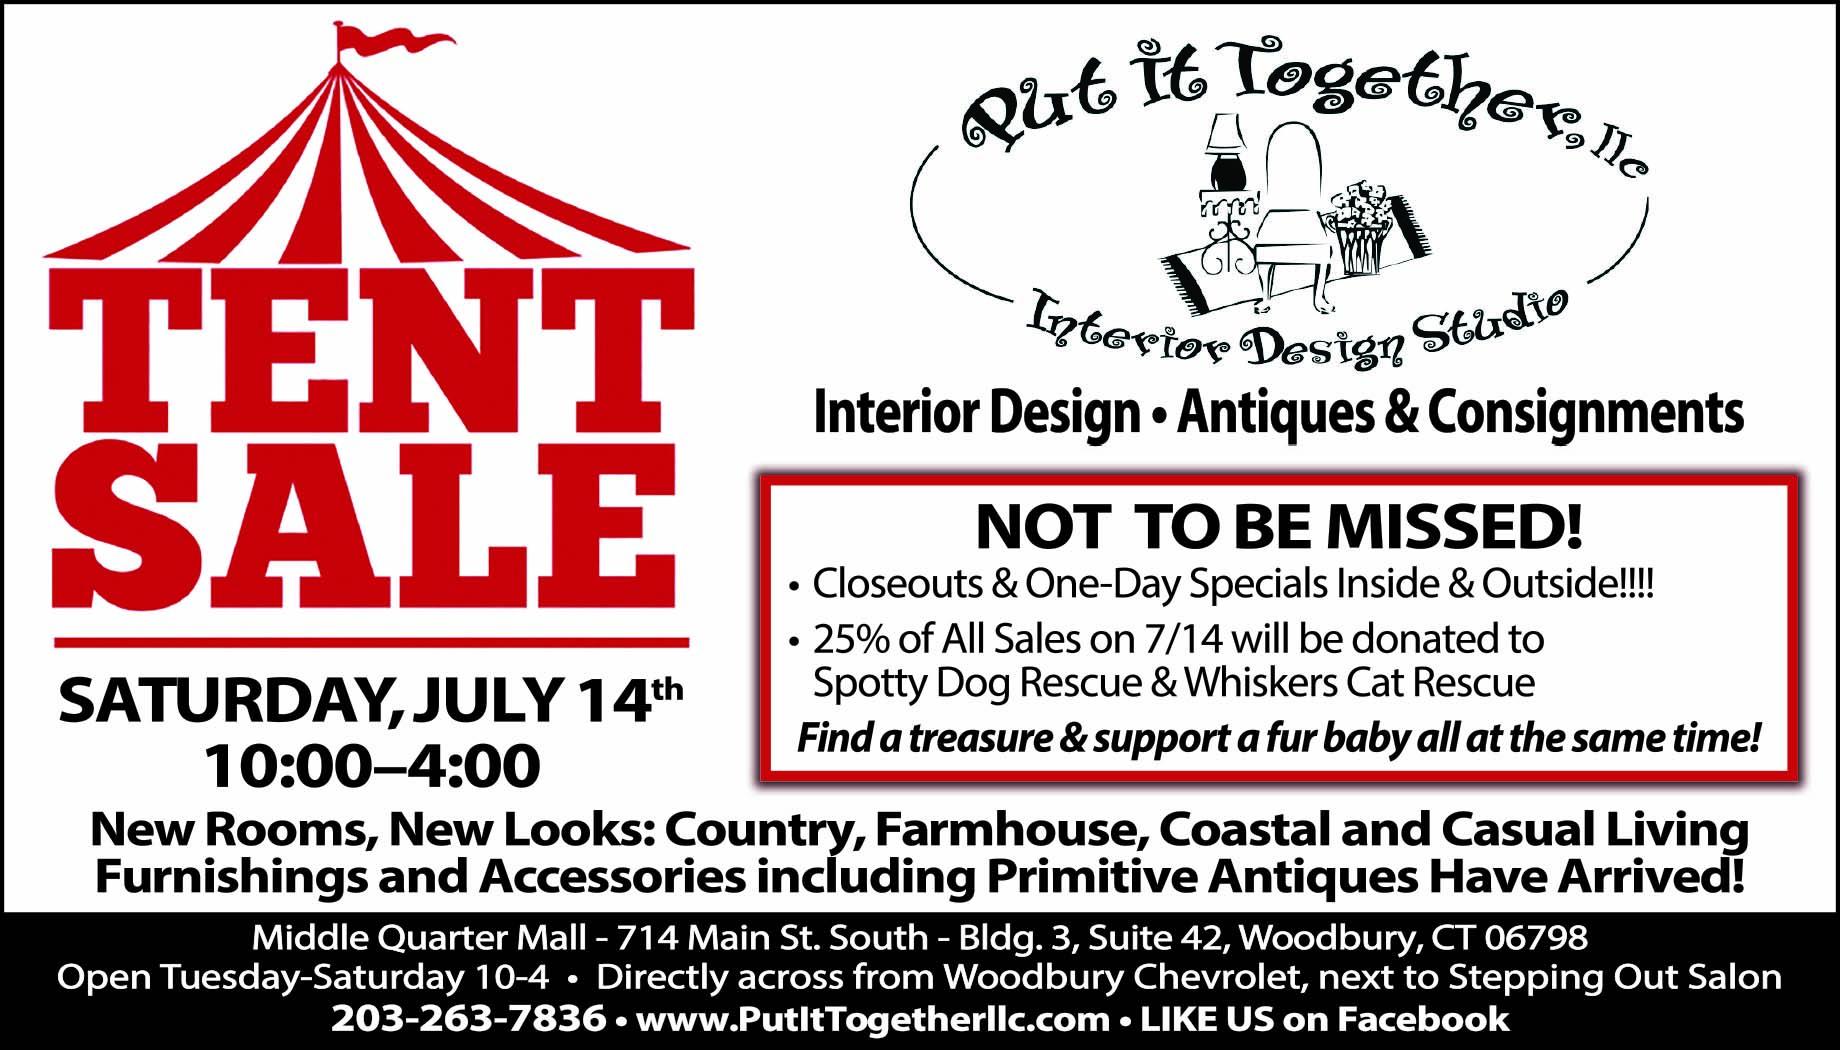 TENT SALE – SATURDAY, JULY 14 (10:00 – 4:00)